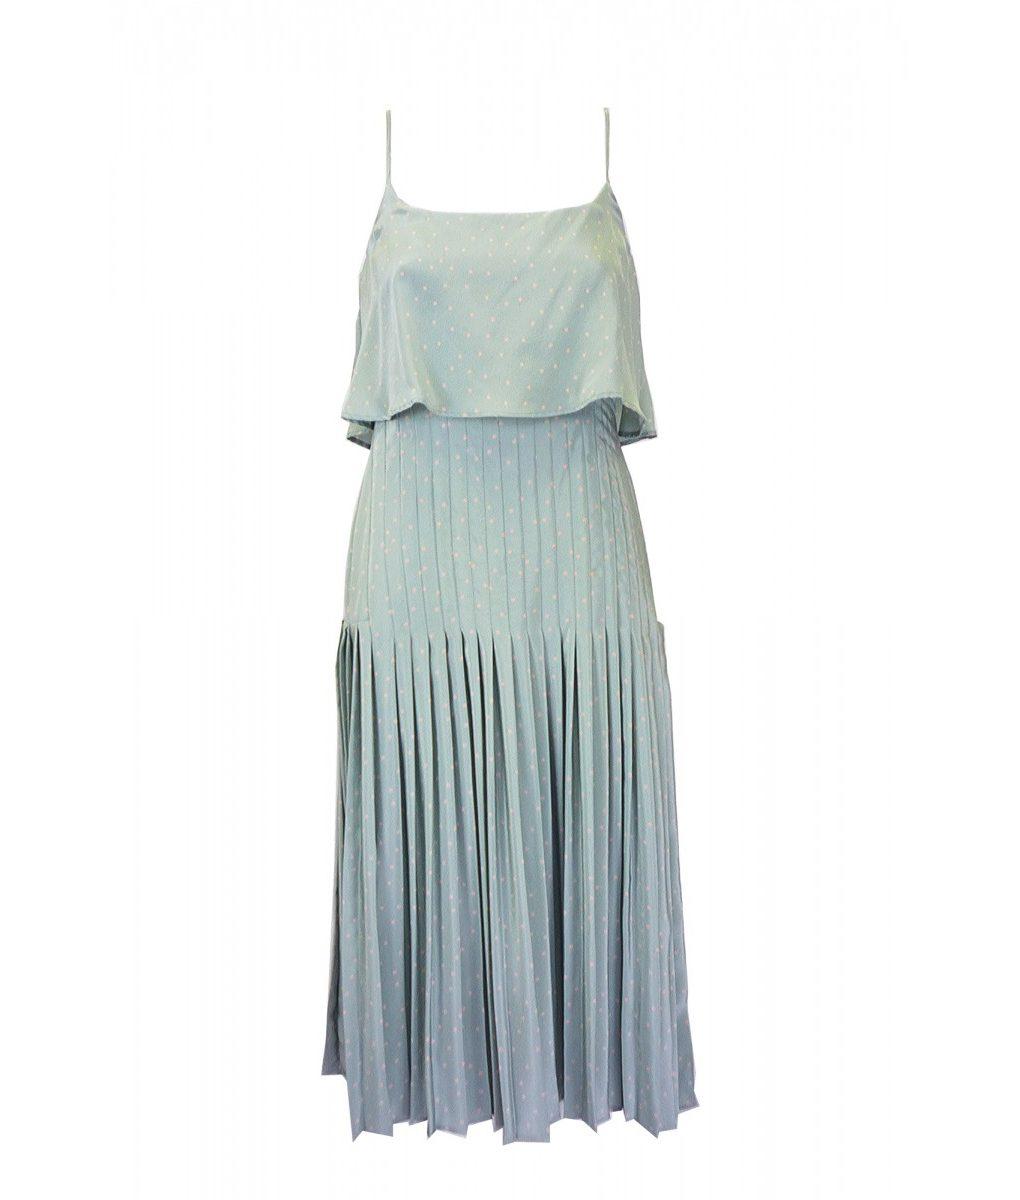 paper-crown-bellflower-dress (3)